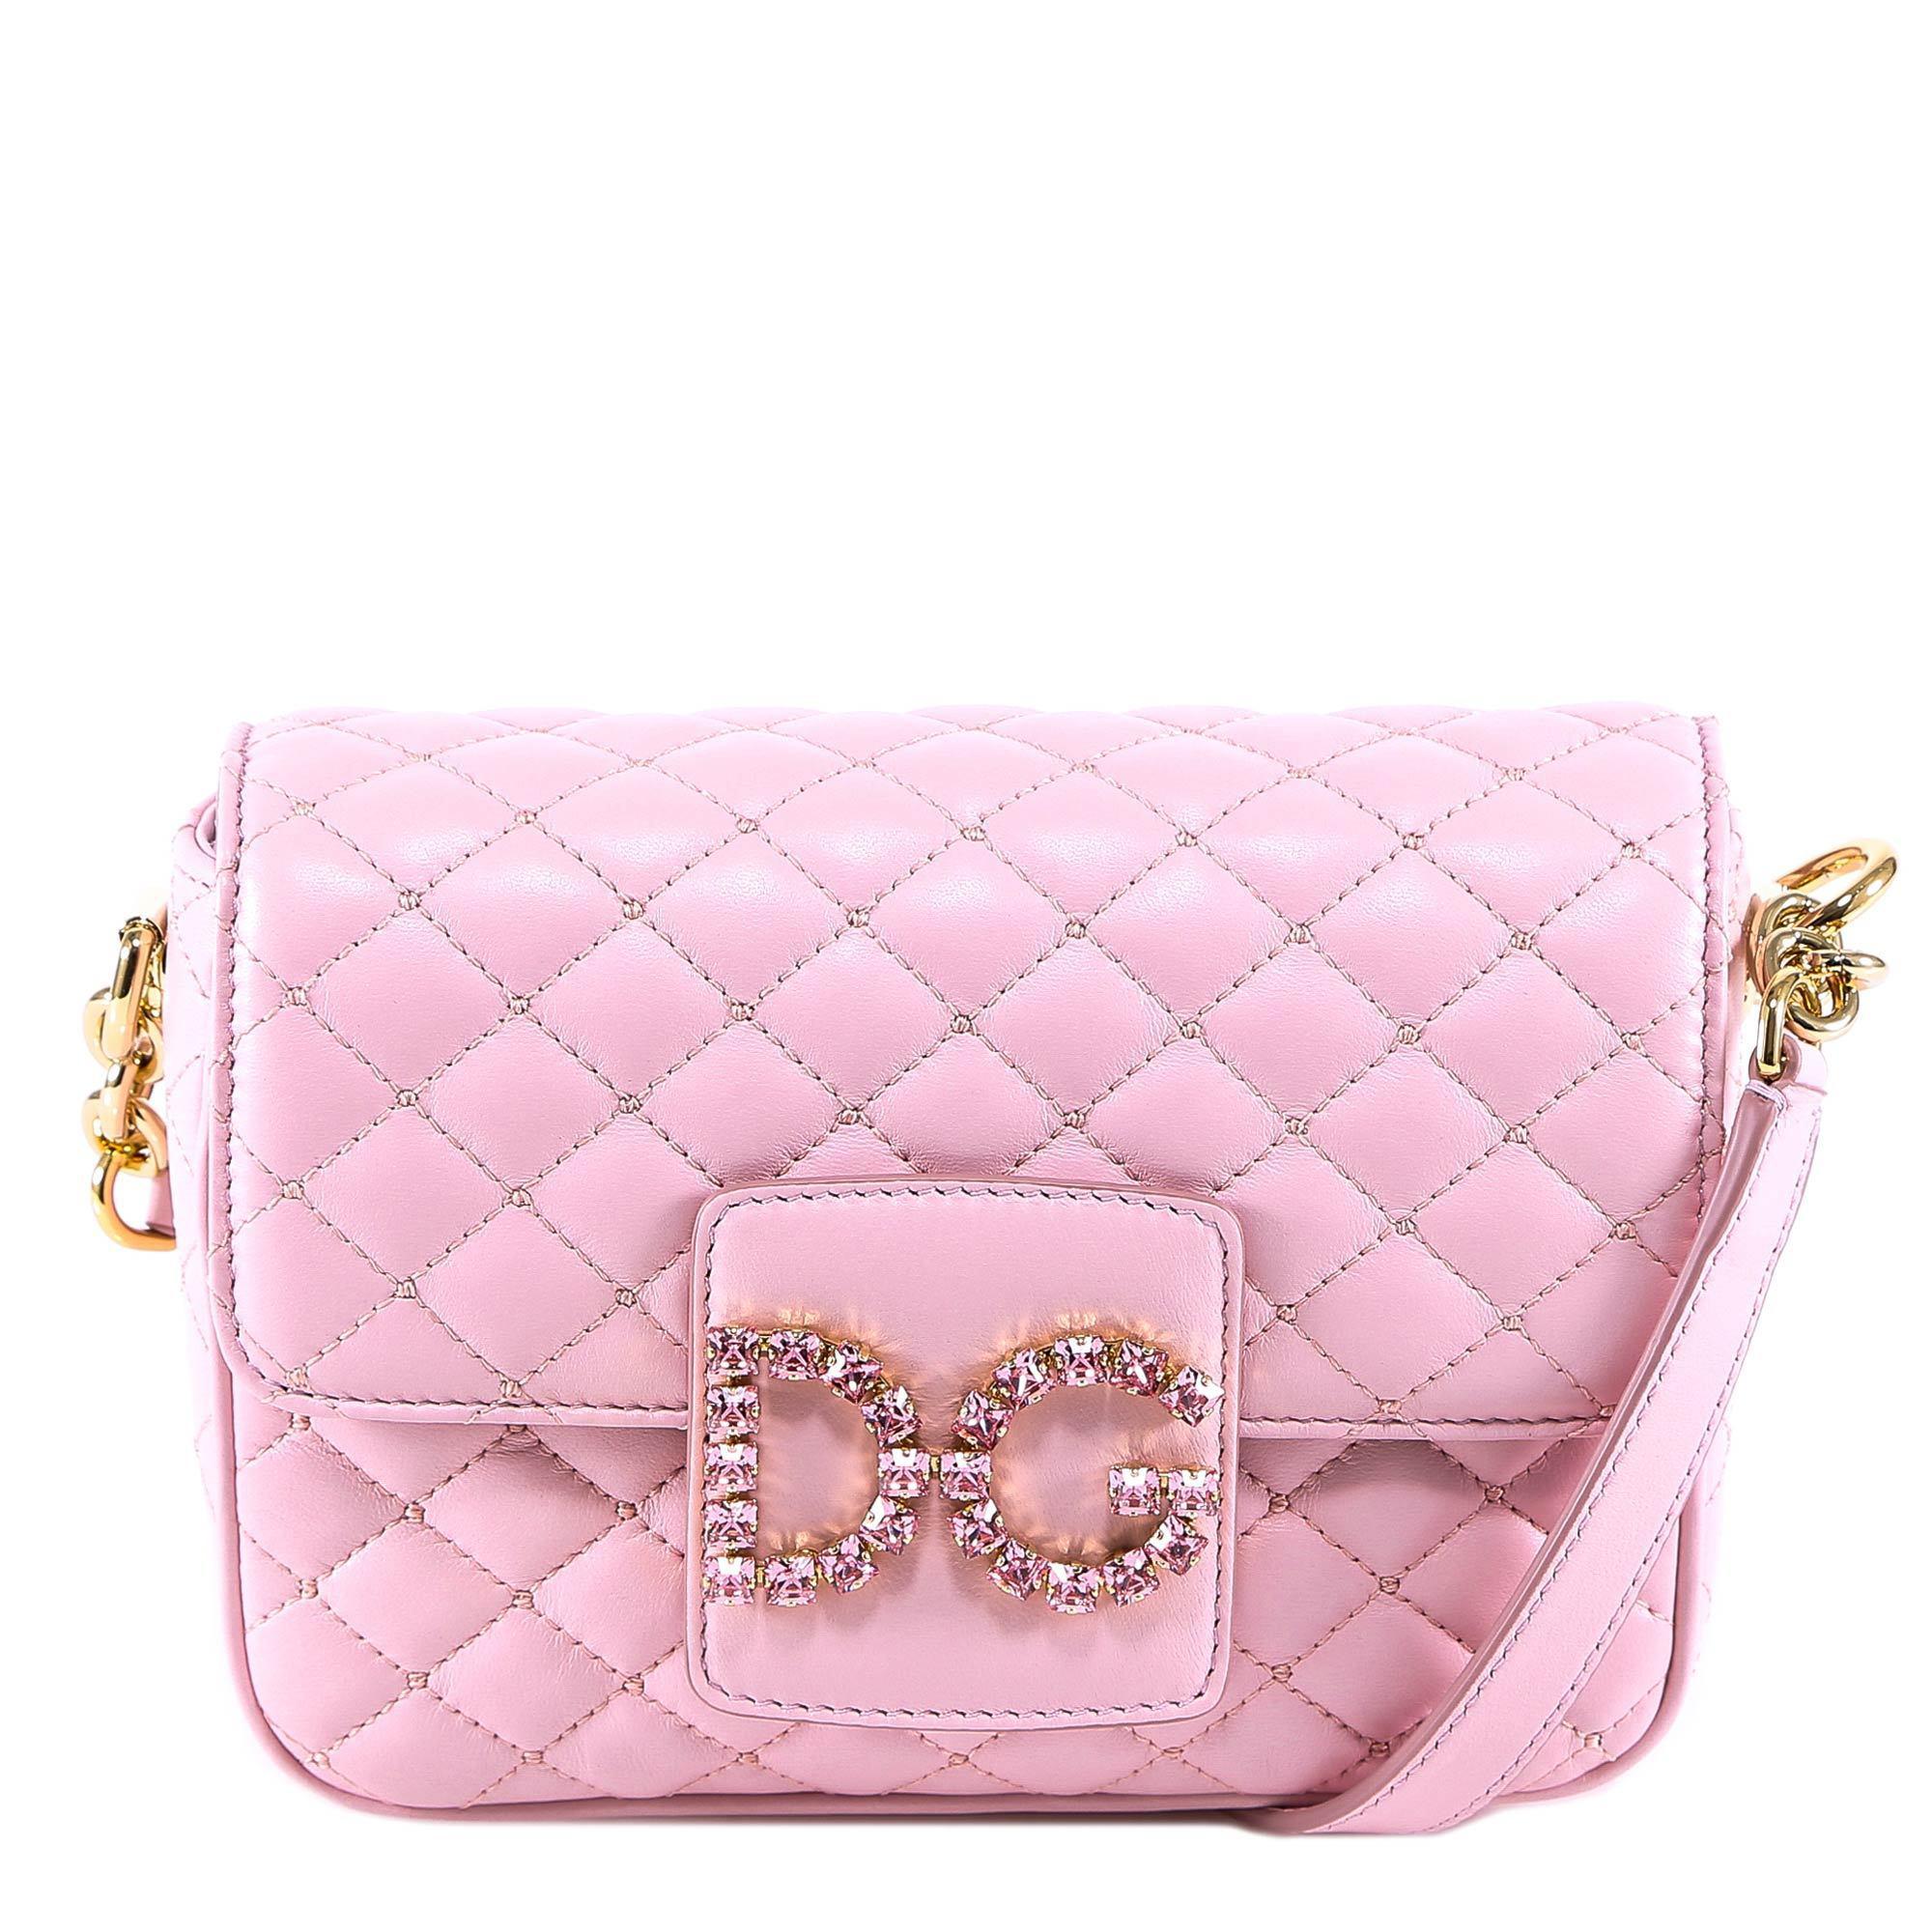 ed75ea2abf5d Lyst - Dolce   Gabbana Dg Millennials Crossbody Bag in Pink